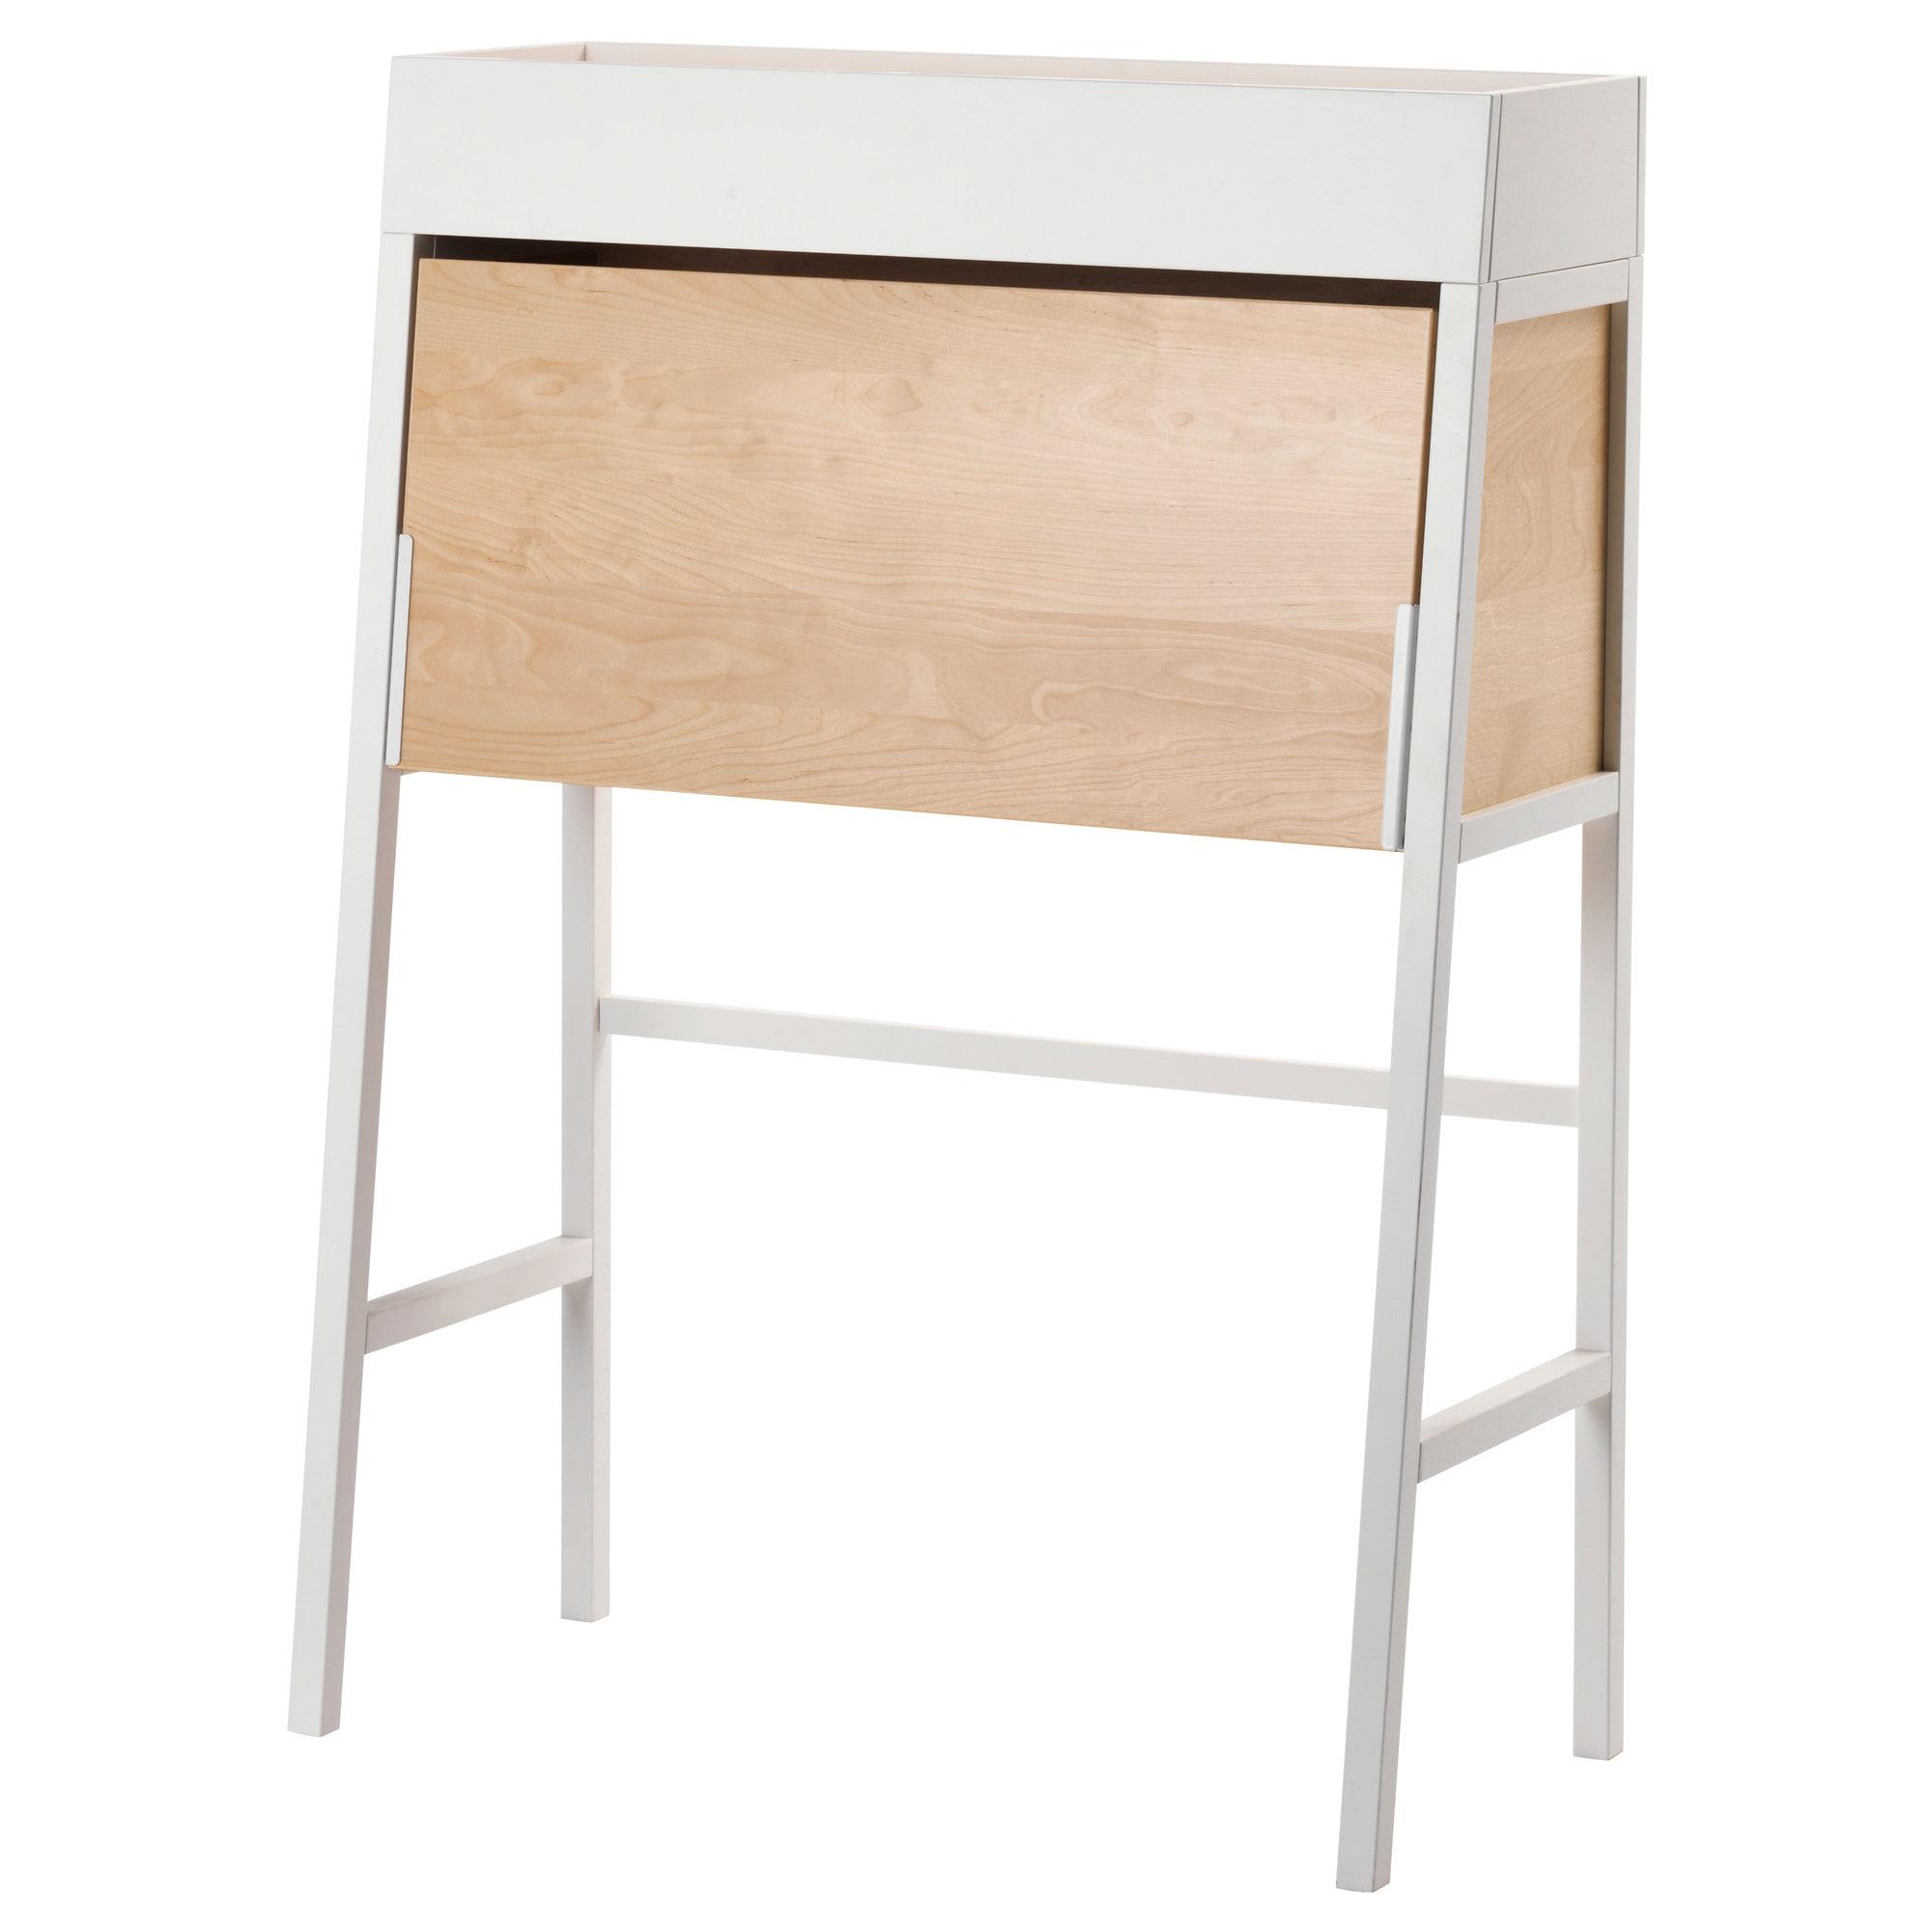 Us Furniture And Home Furnishings Ikea Ps 2014 Ikea Ps